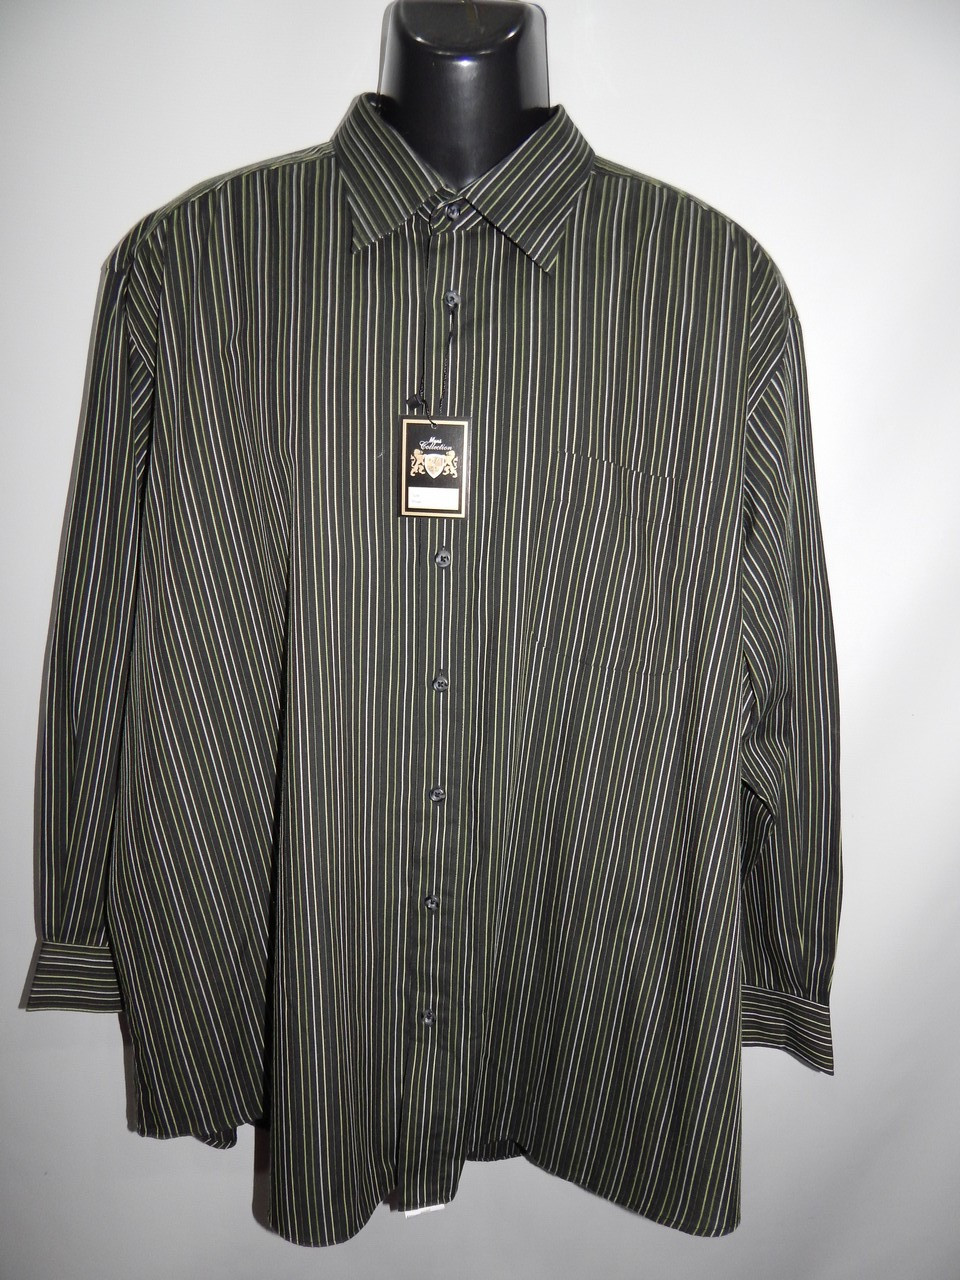 Мужская рубашка с длинным рукавом Jupiter оригинал 025ДР р.56 батал